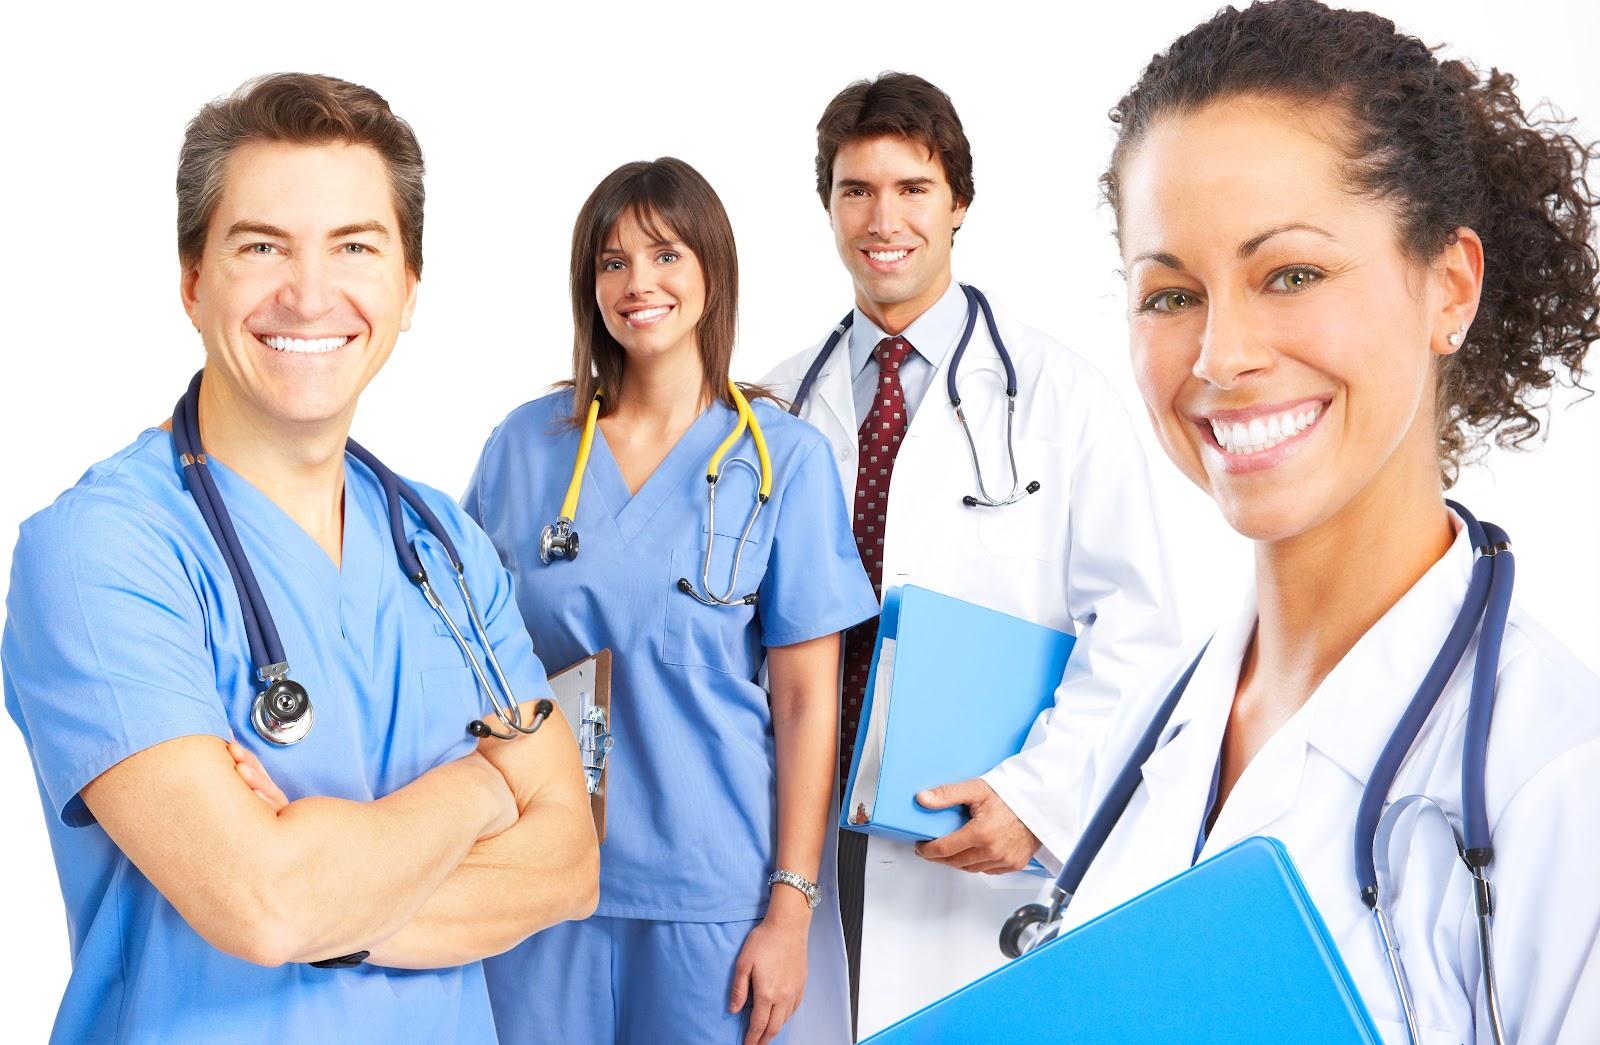 Daylight is the best medicine, for nurses